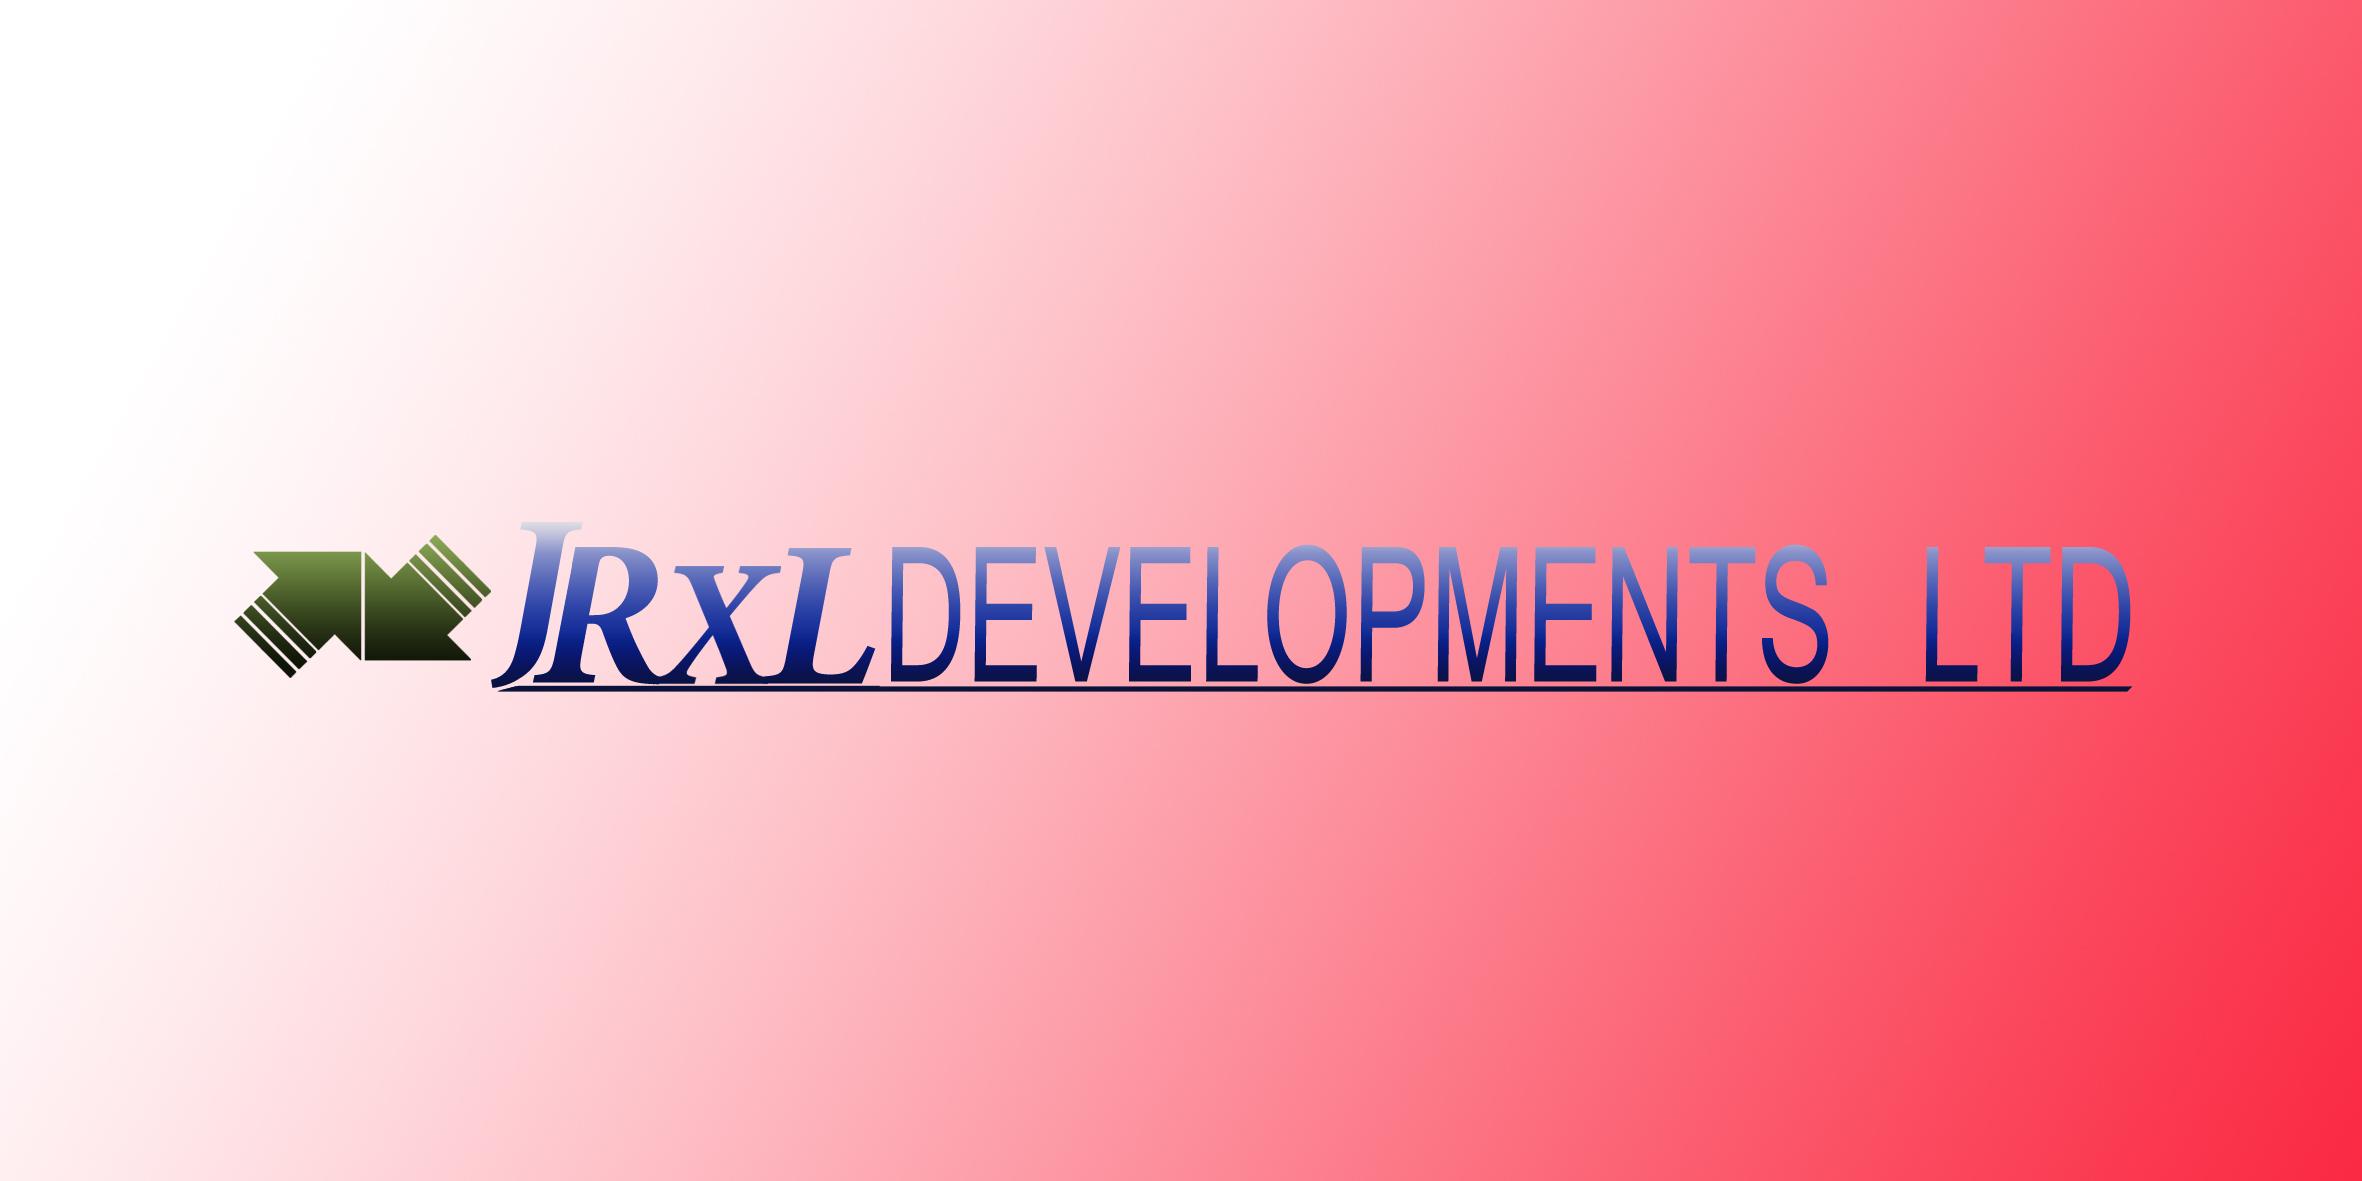 Logo Design by Jerry Nable Jr - Entry No. 20 in the Logo Design Contest JRXL DEVELOPMENTS LTD Logo Design.